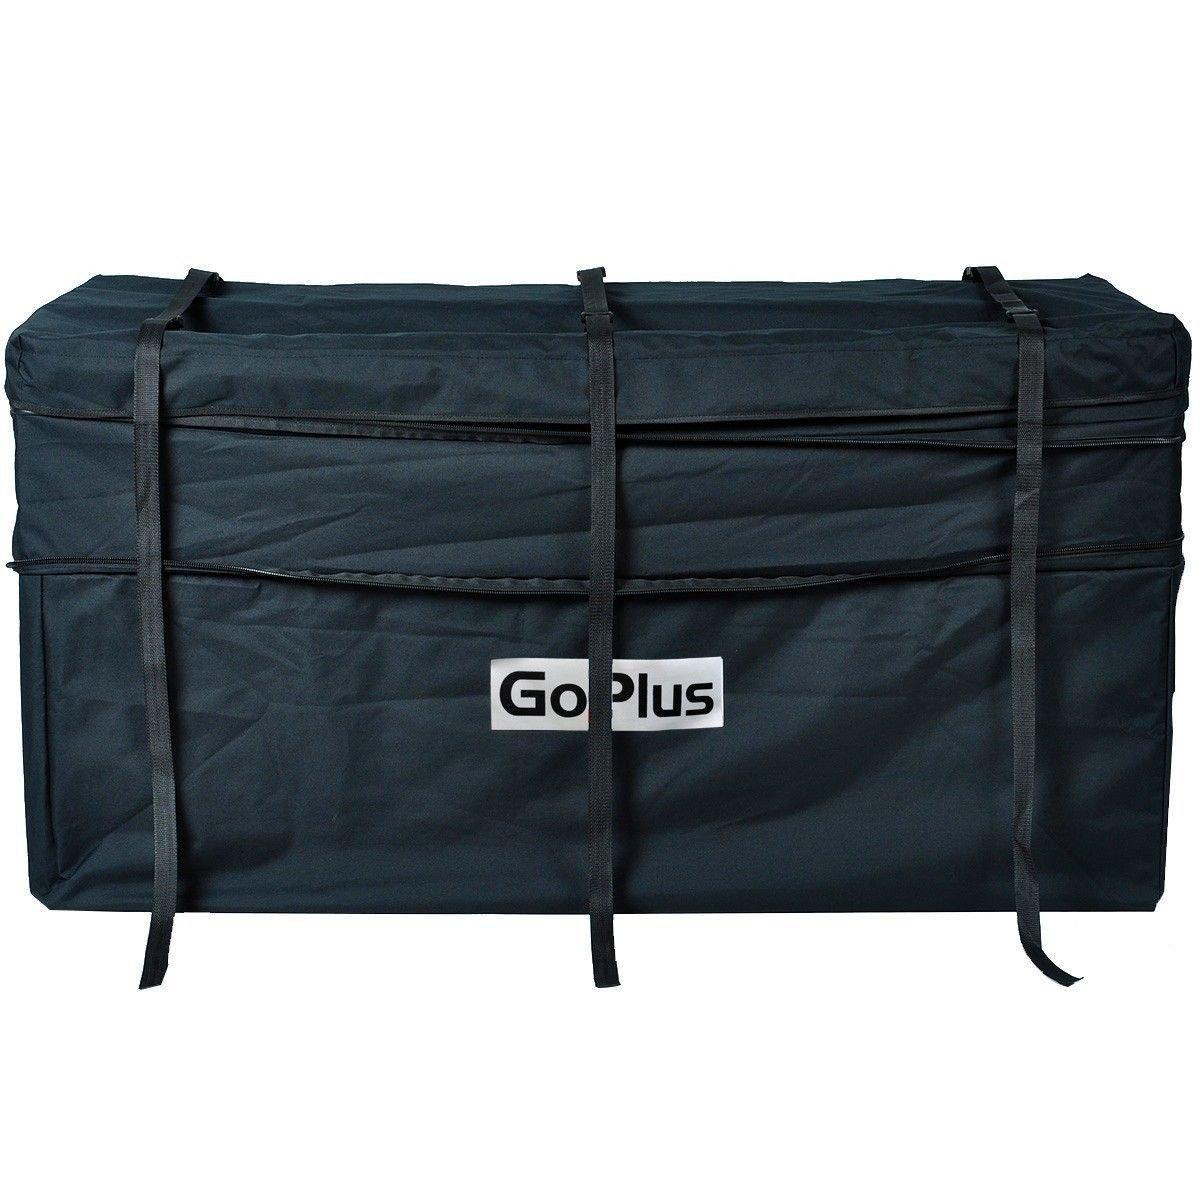 Jumbo Car Suv Roof Top Waterproof Luggage Travel Cargo ...